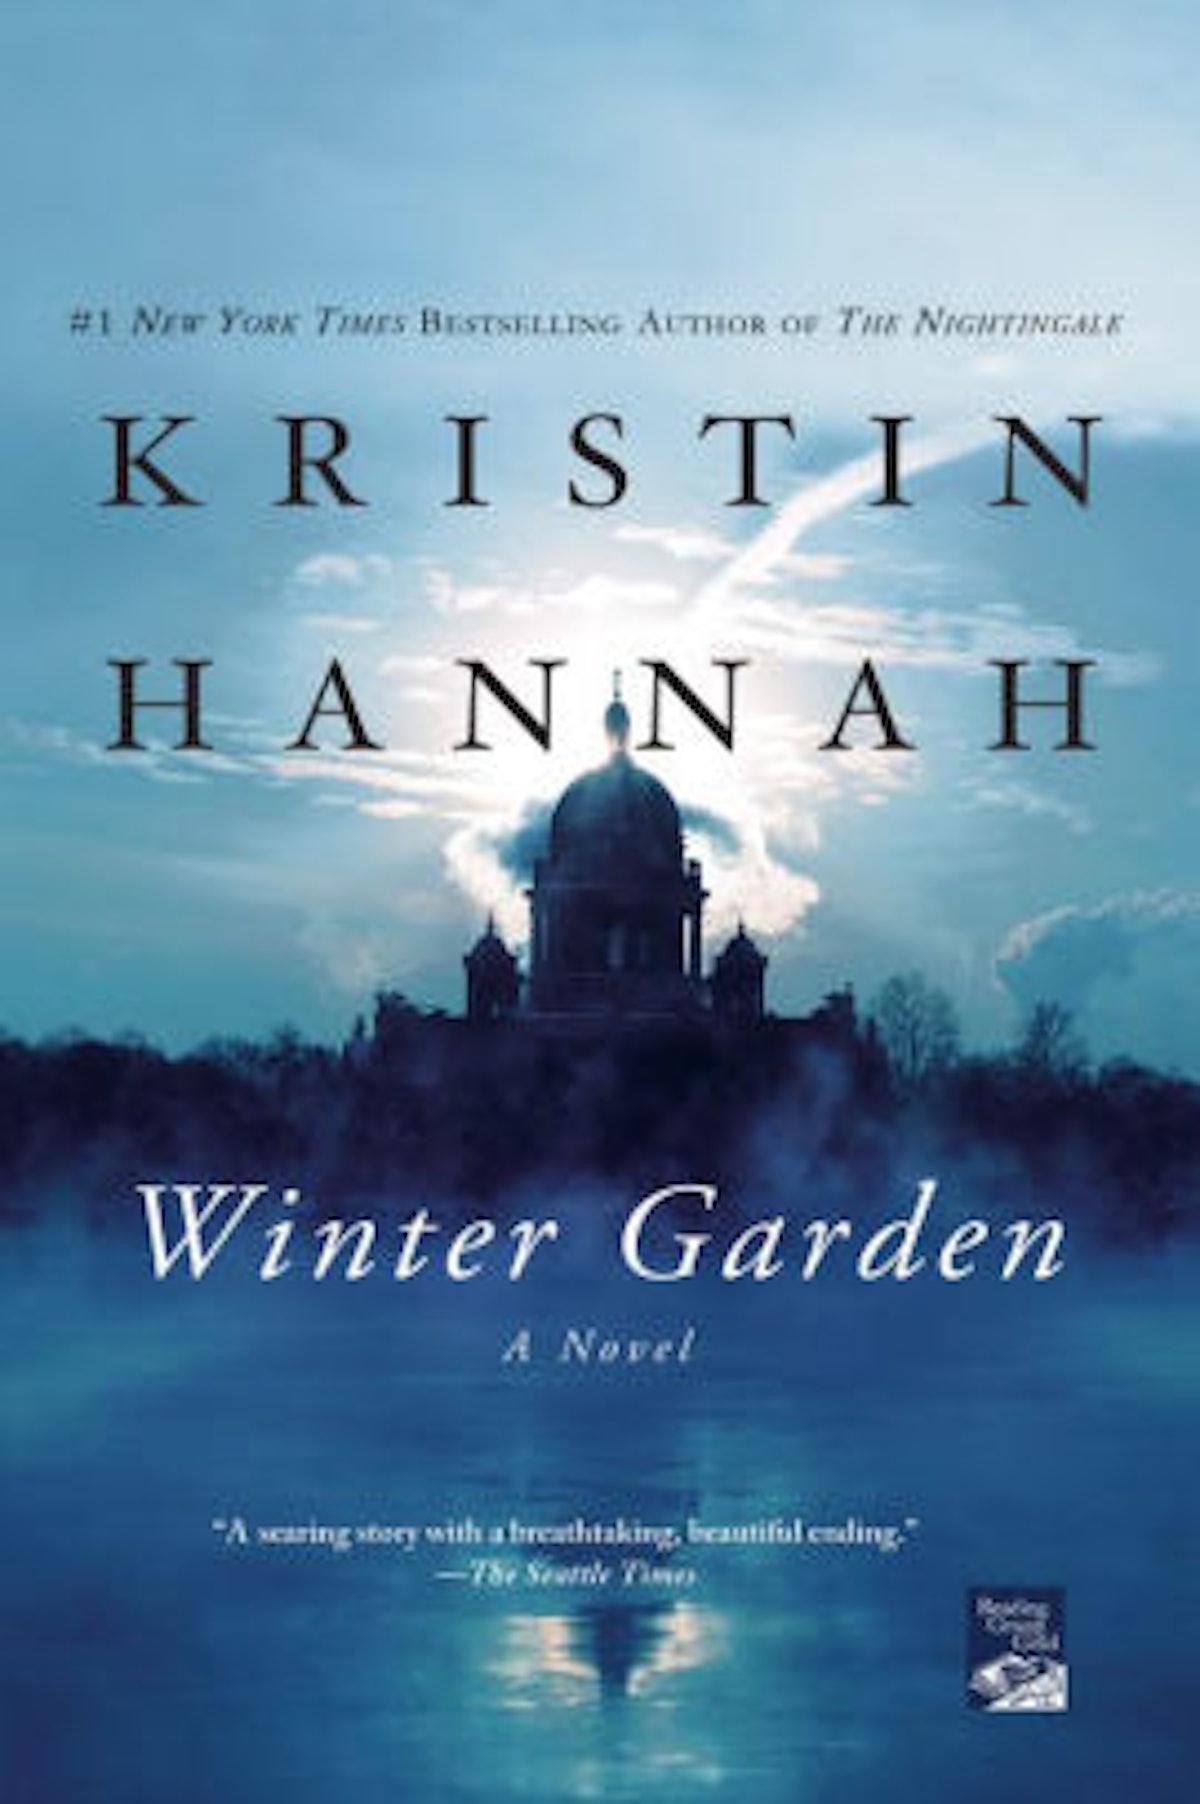 'Winter Garden: A Novel' by Kristin Hannah